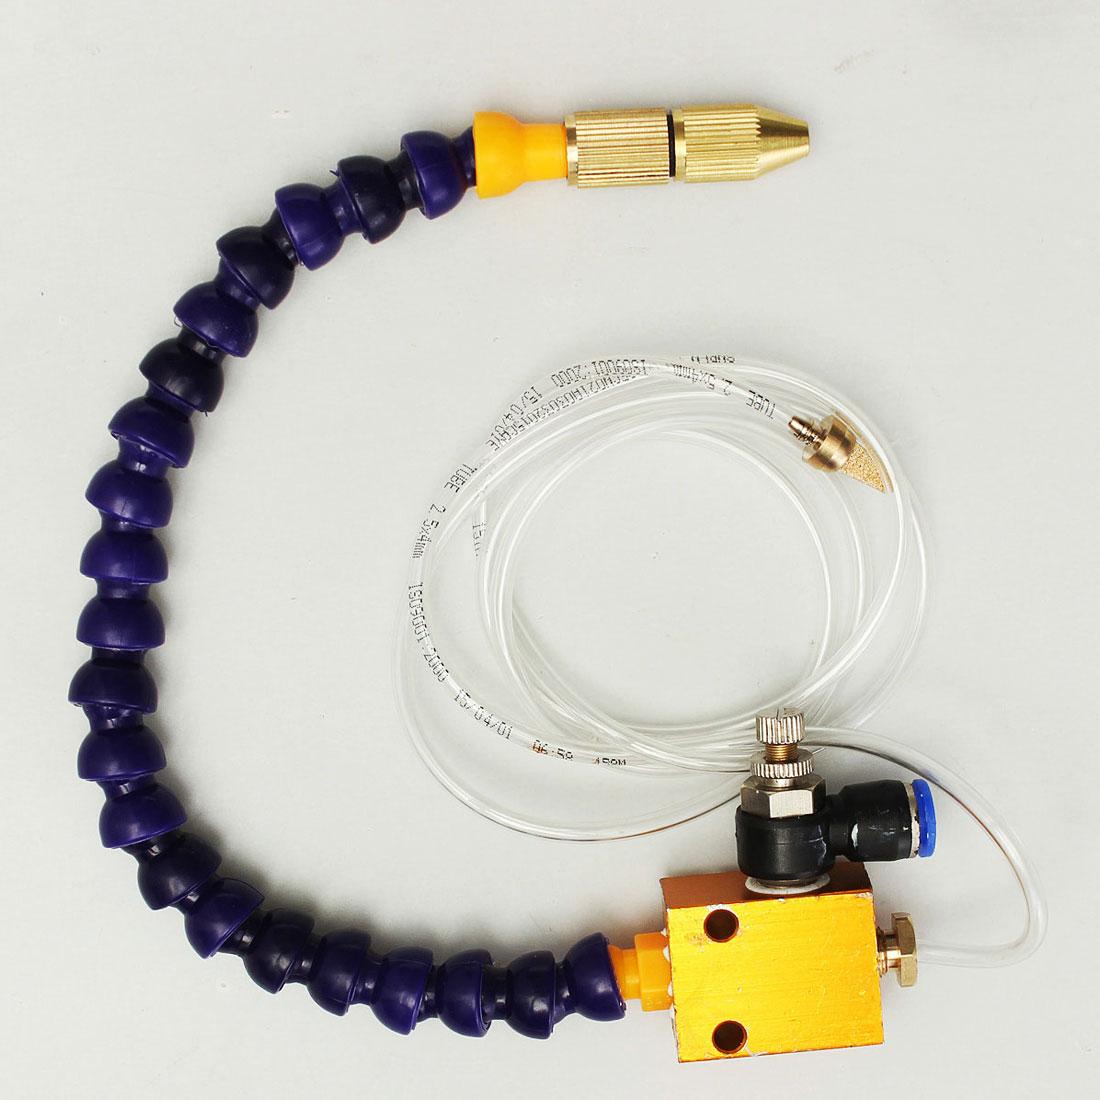 Mist Coolant Lubrication Spray System Unit for CNC Lathe Milling Machine Accessories